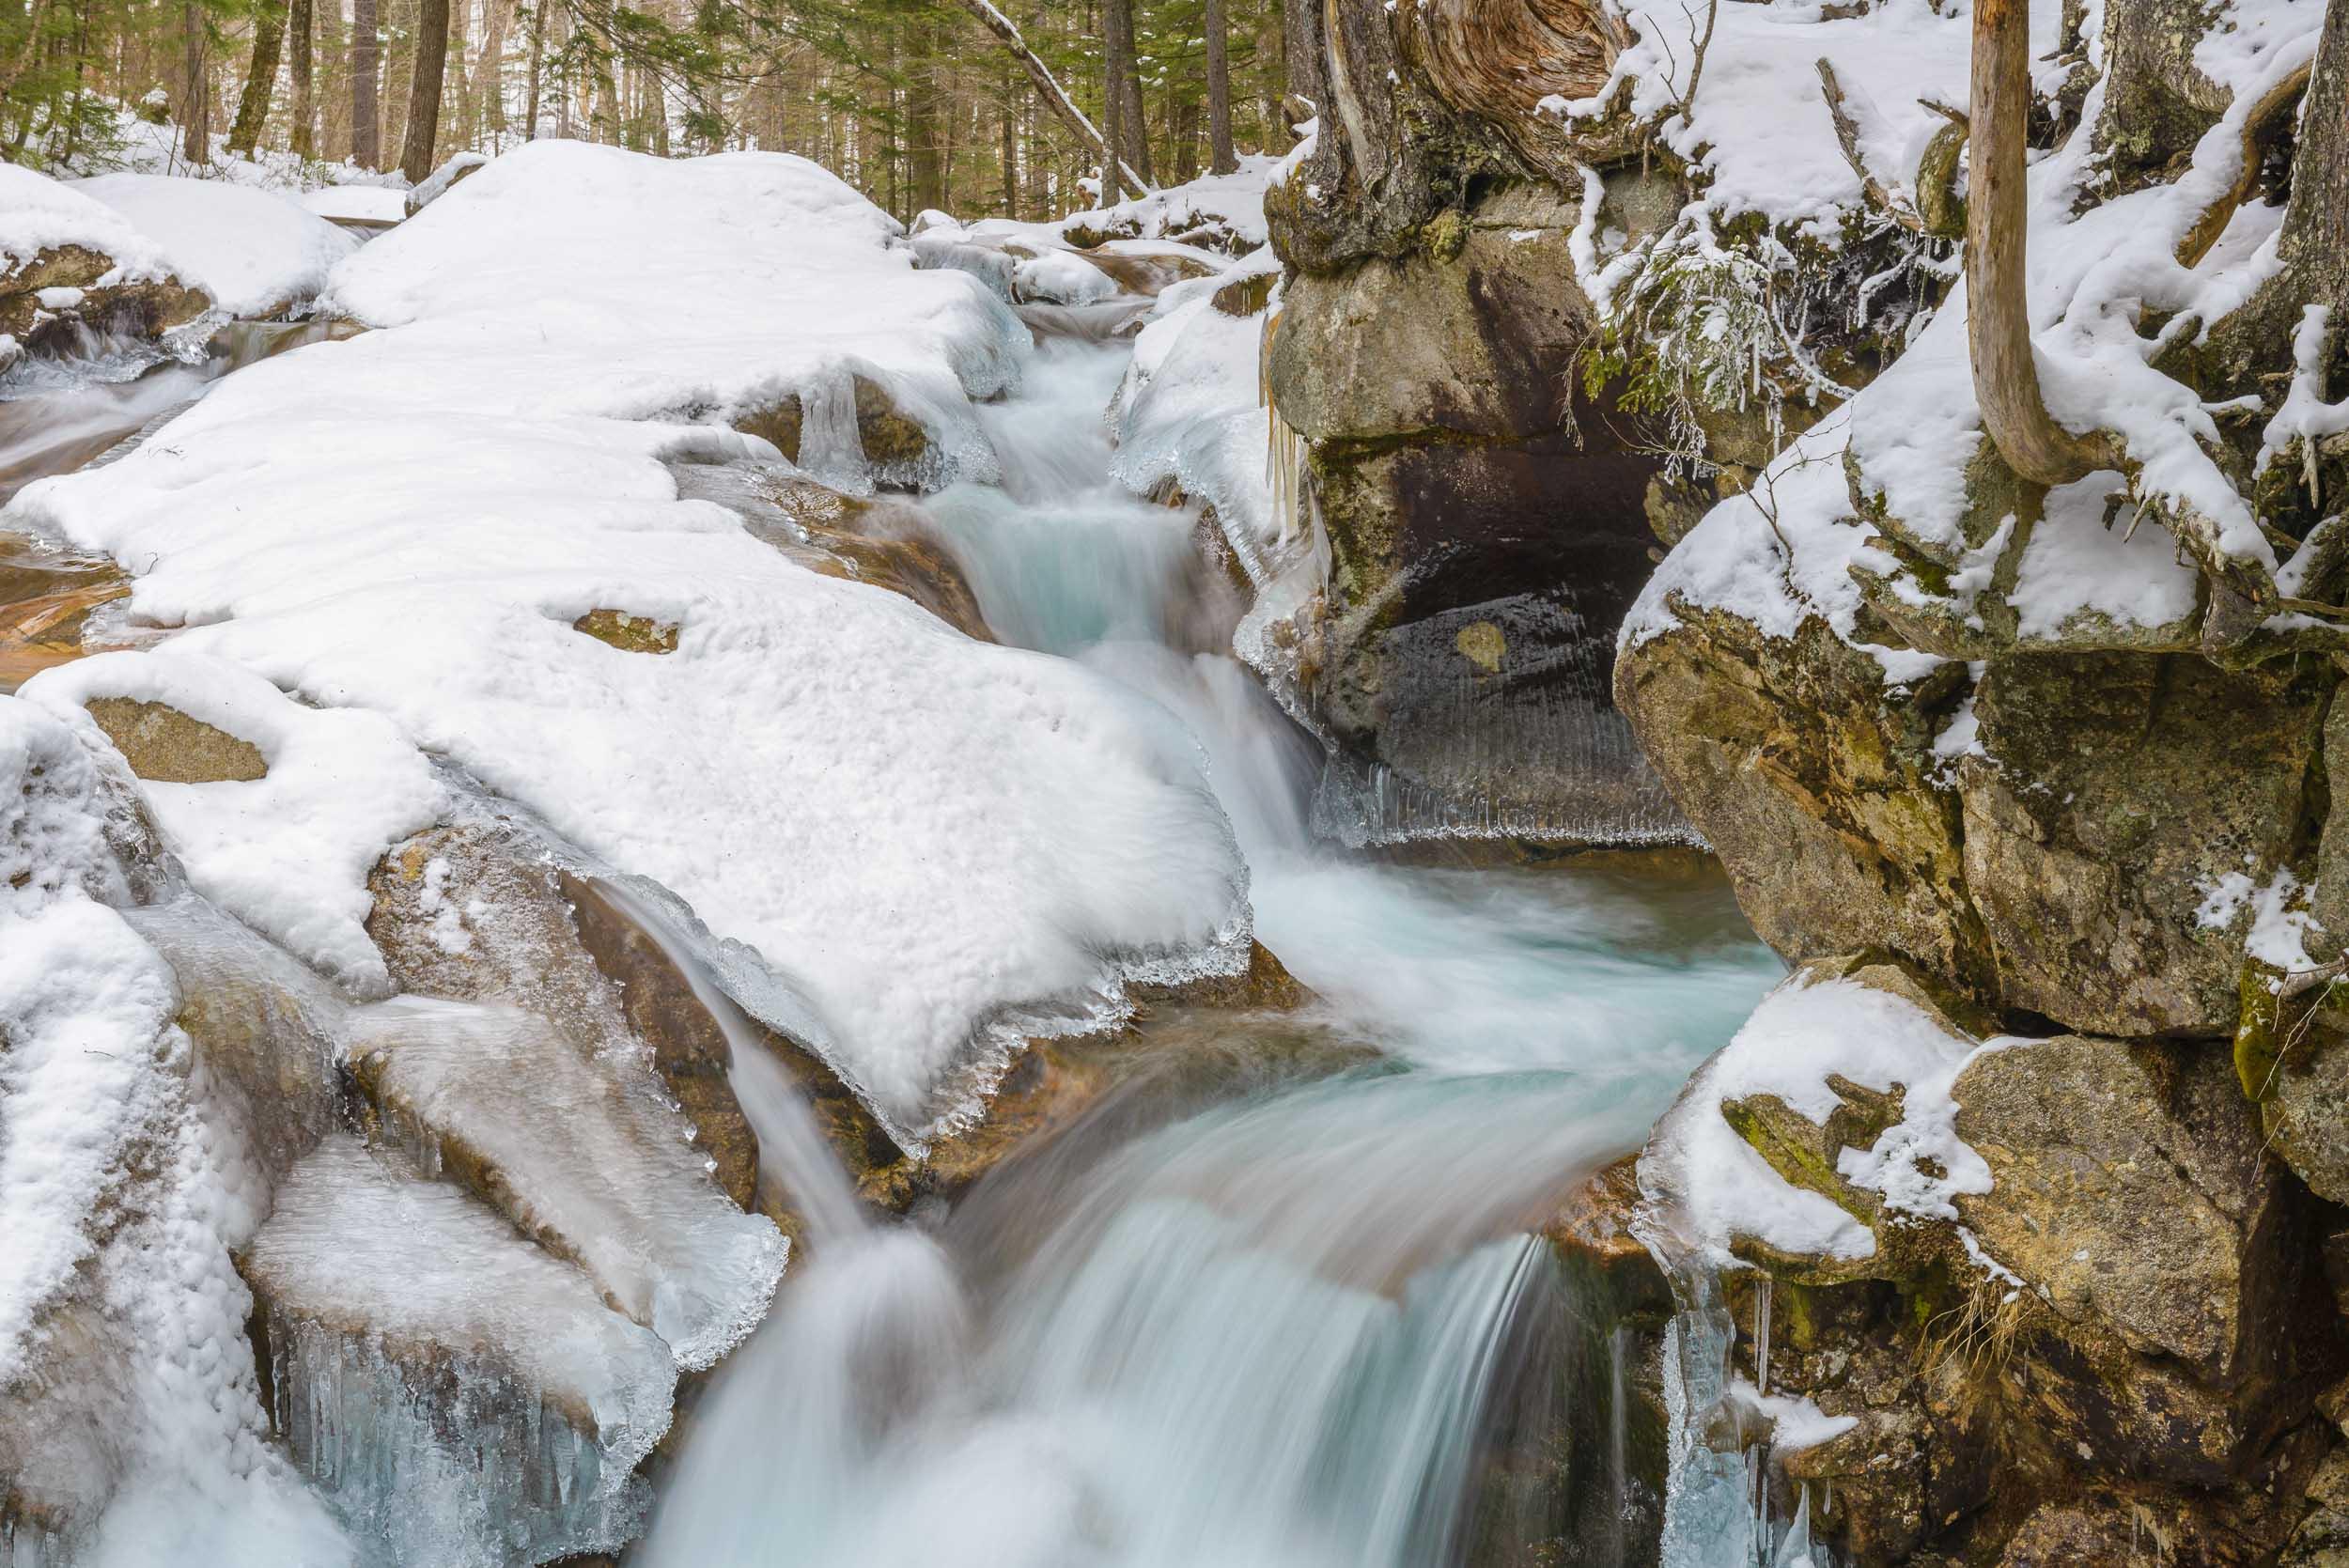 Winter_Waterfall_White_Mountains_NH_Jeff_Baumgart_Creative_Media-1.jpg